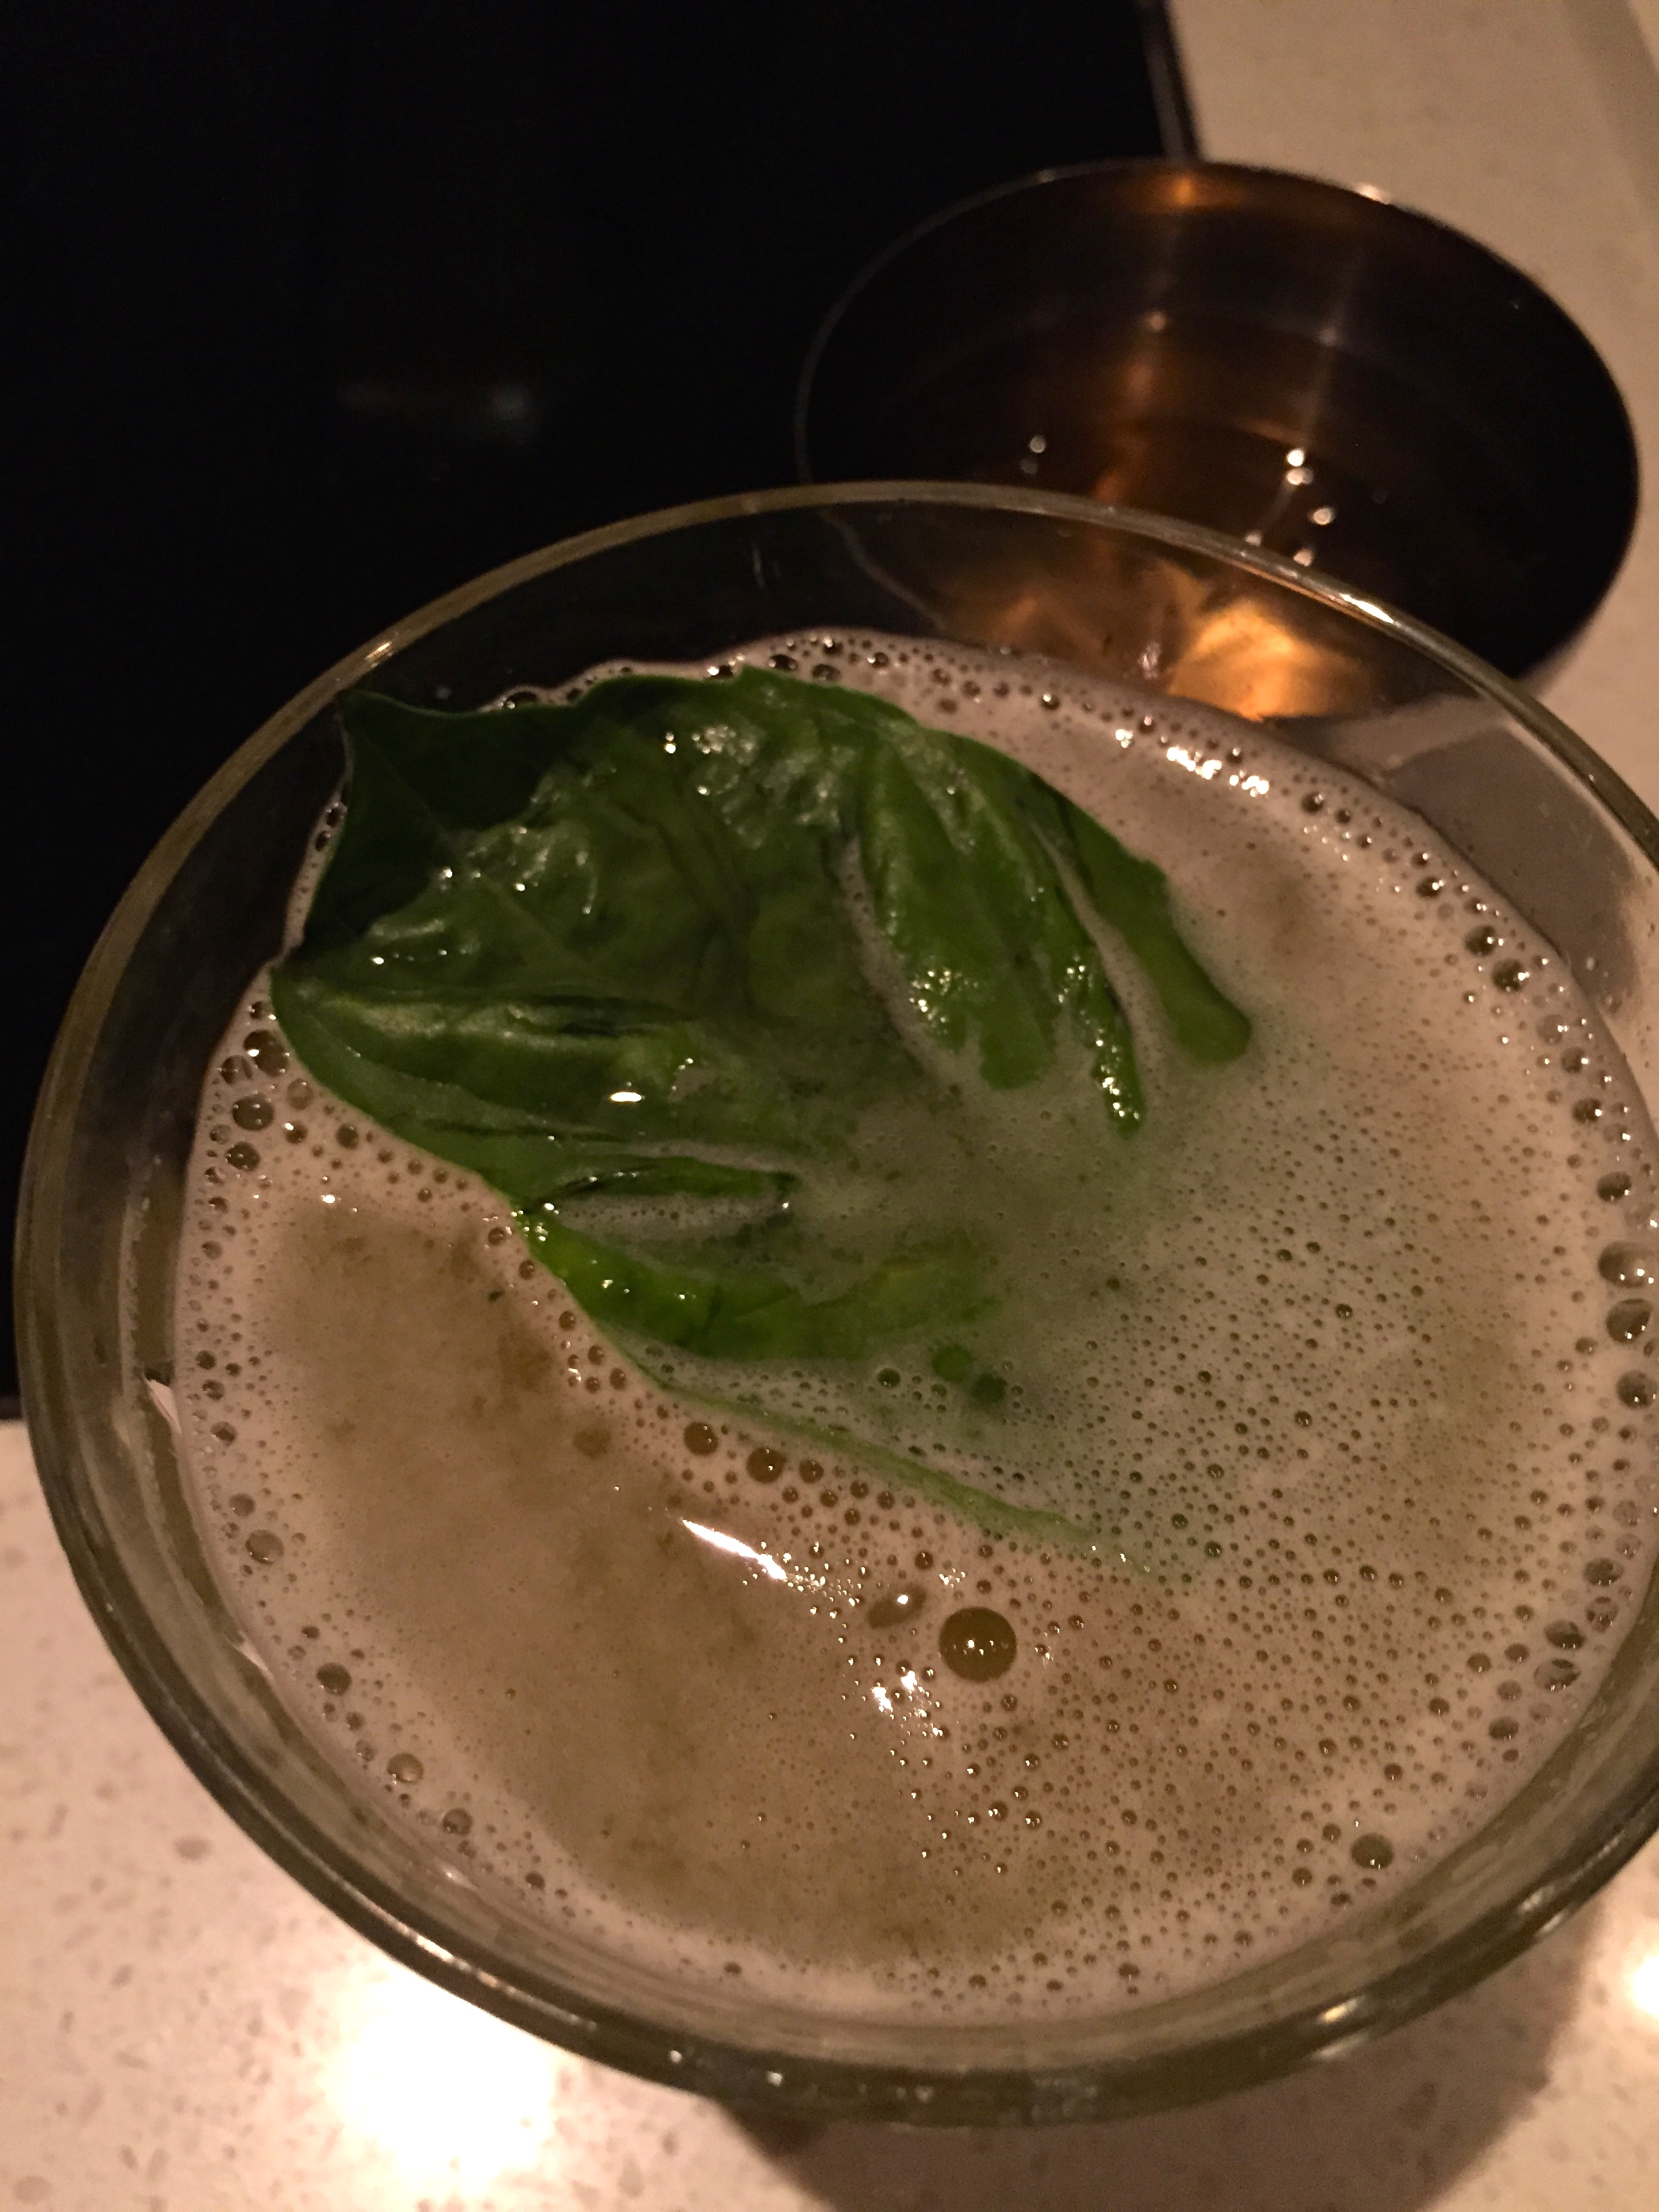 Basil cocktail.